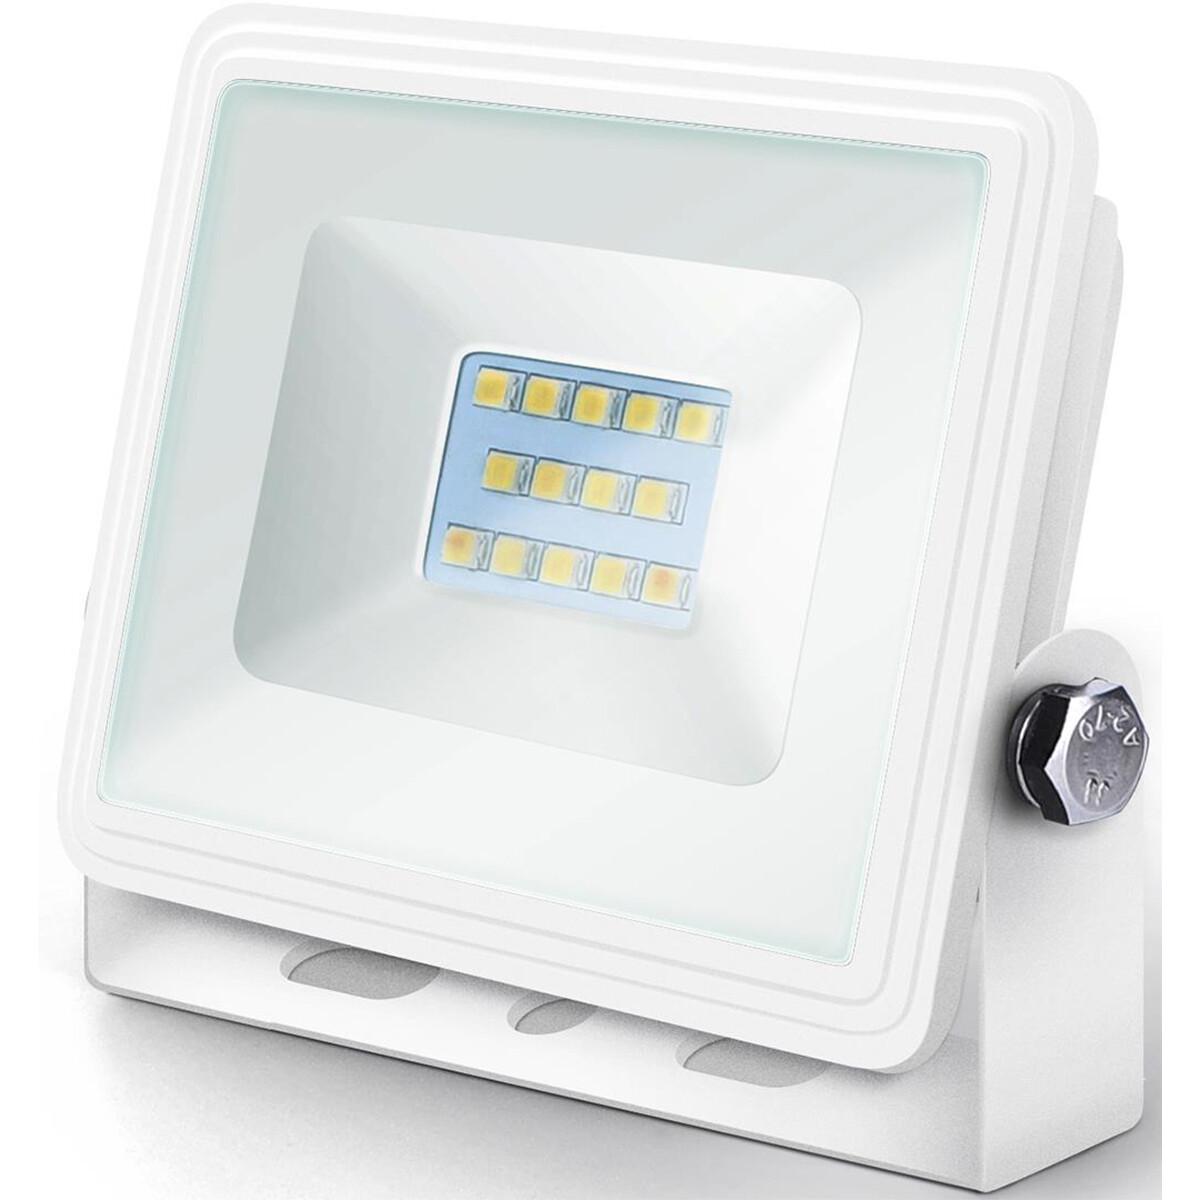 LED Bouwlamp 10 Watt - LED Schijnwerper - Aigi Iglo - Natuurlijk Wit 4000K - Waterdicht IP65 - Mat Wit - Aluminium